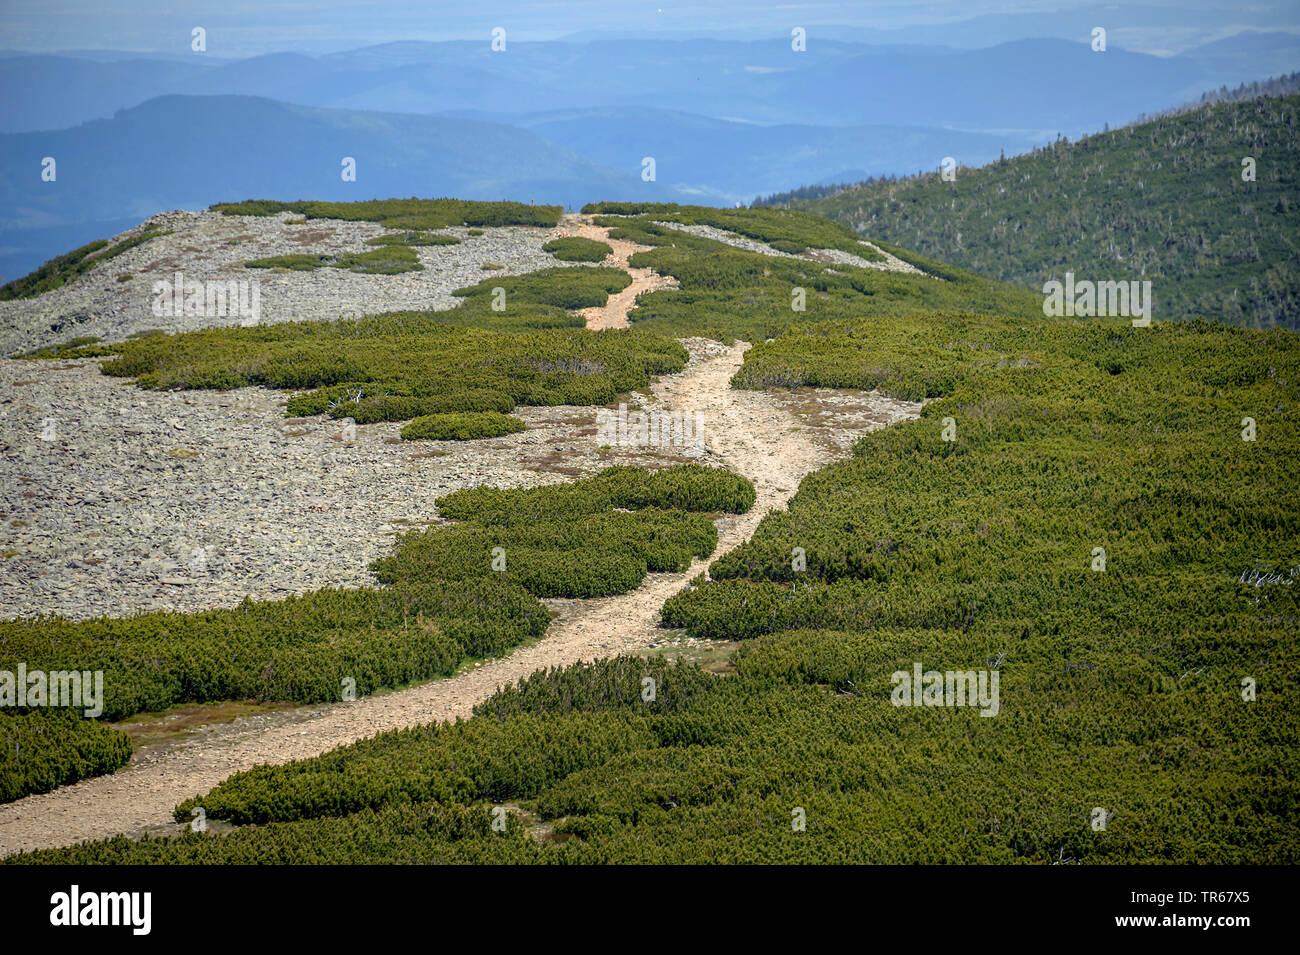 Mountain pine, Mugo pine (Pinus mugo var pumilio), on Schneekoppe in the Giant Mountains, Czech Republic Stock Photo